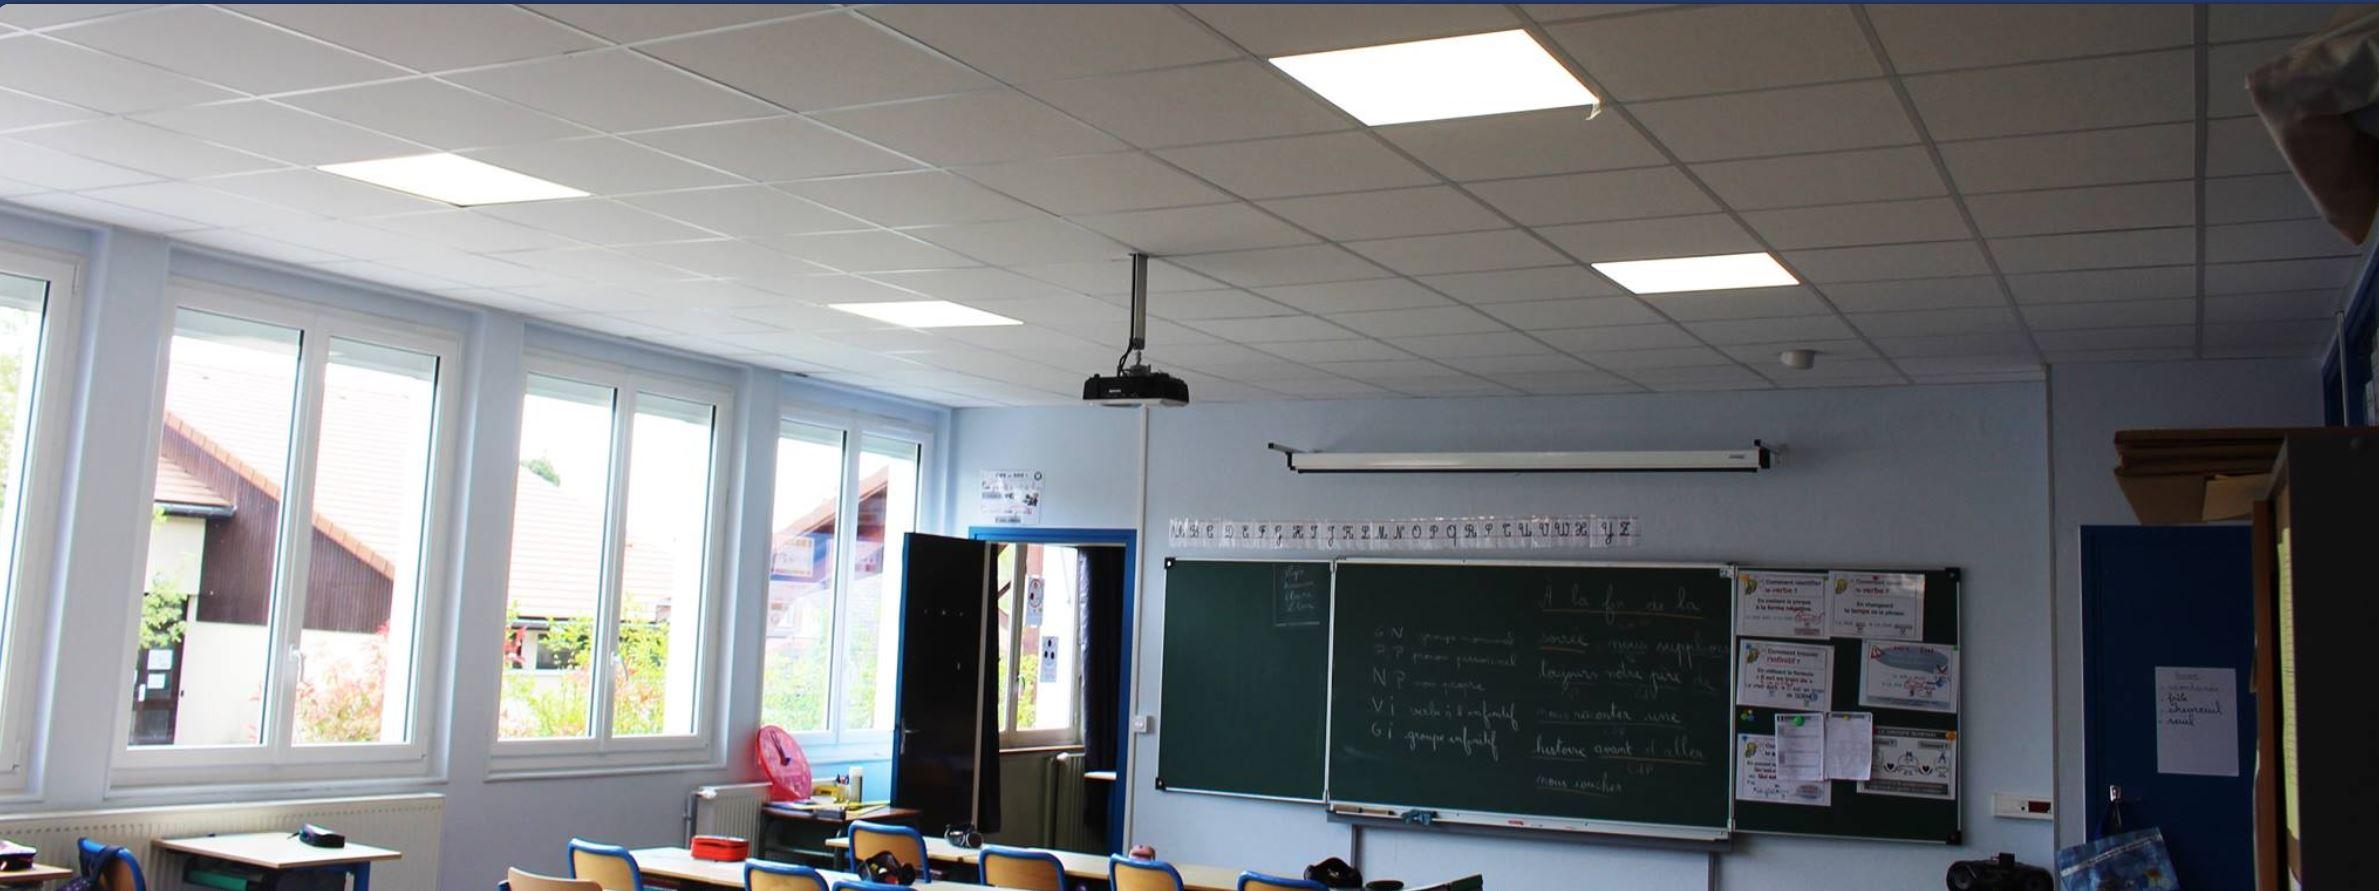 Ecole Rives